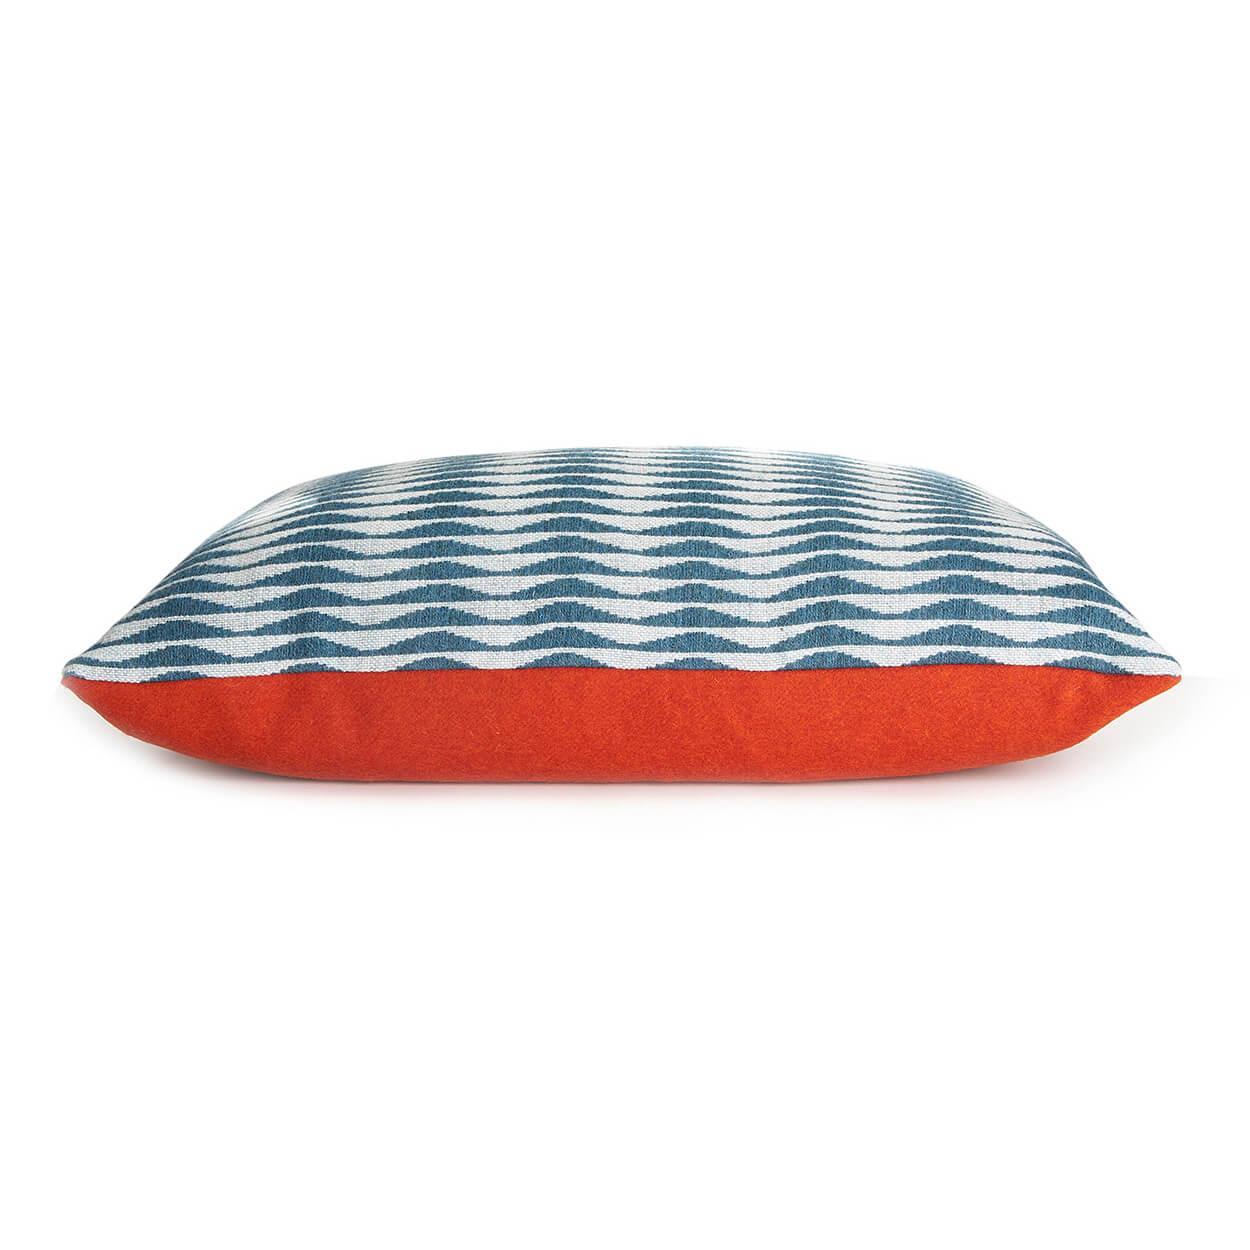 White background photography of a designer cushion